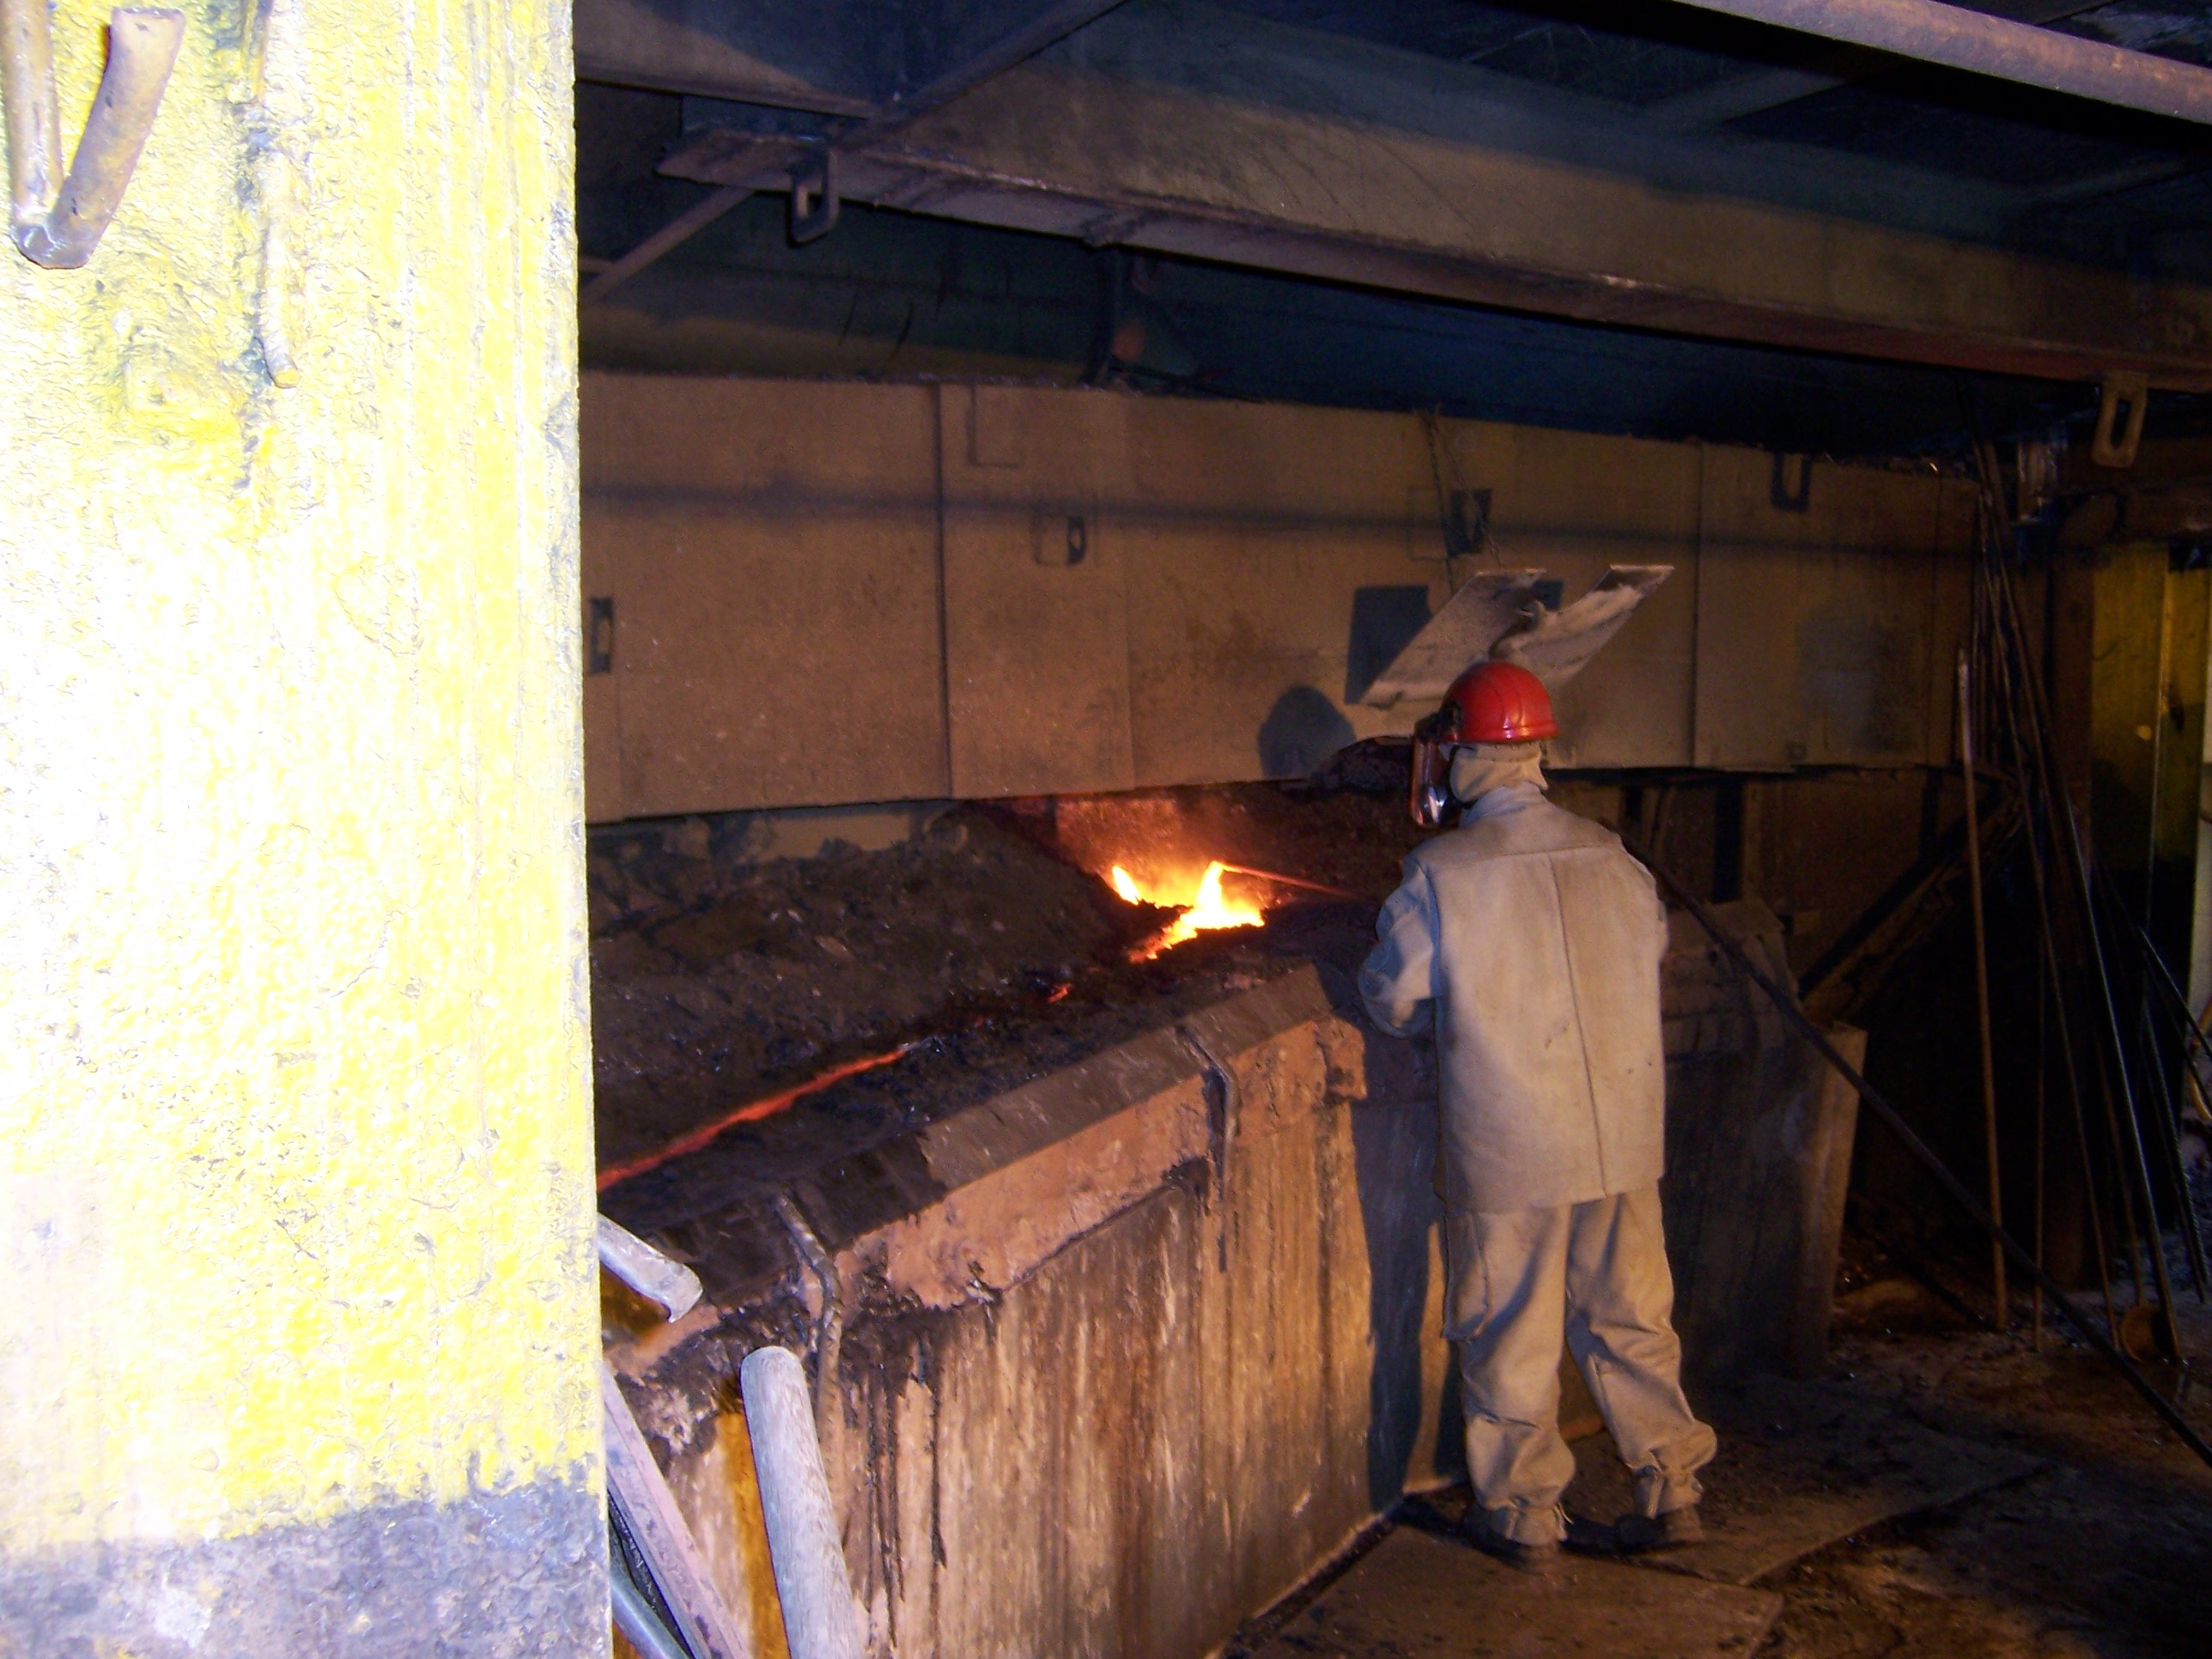 Doe Run smelter worker